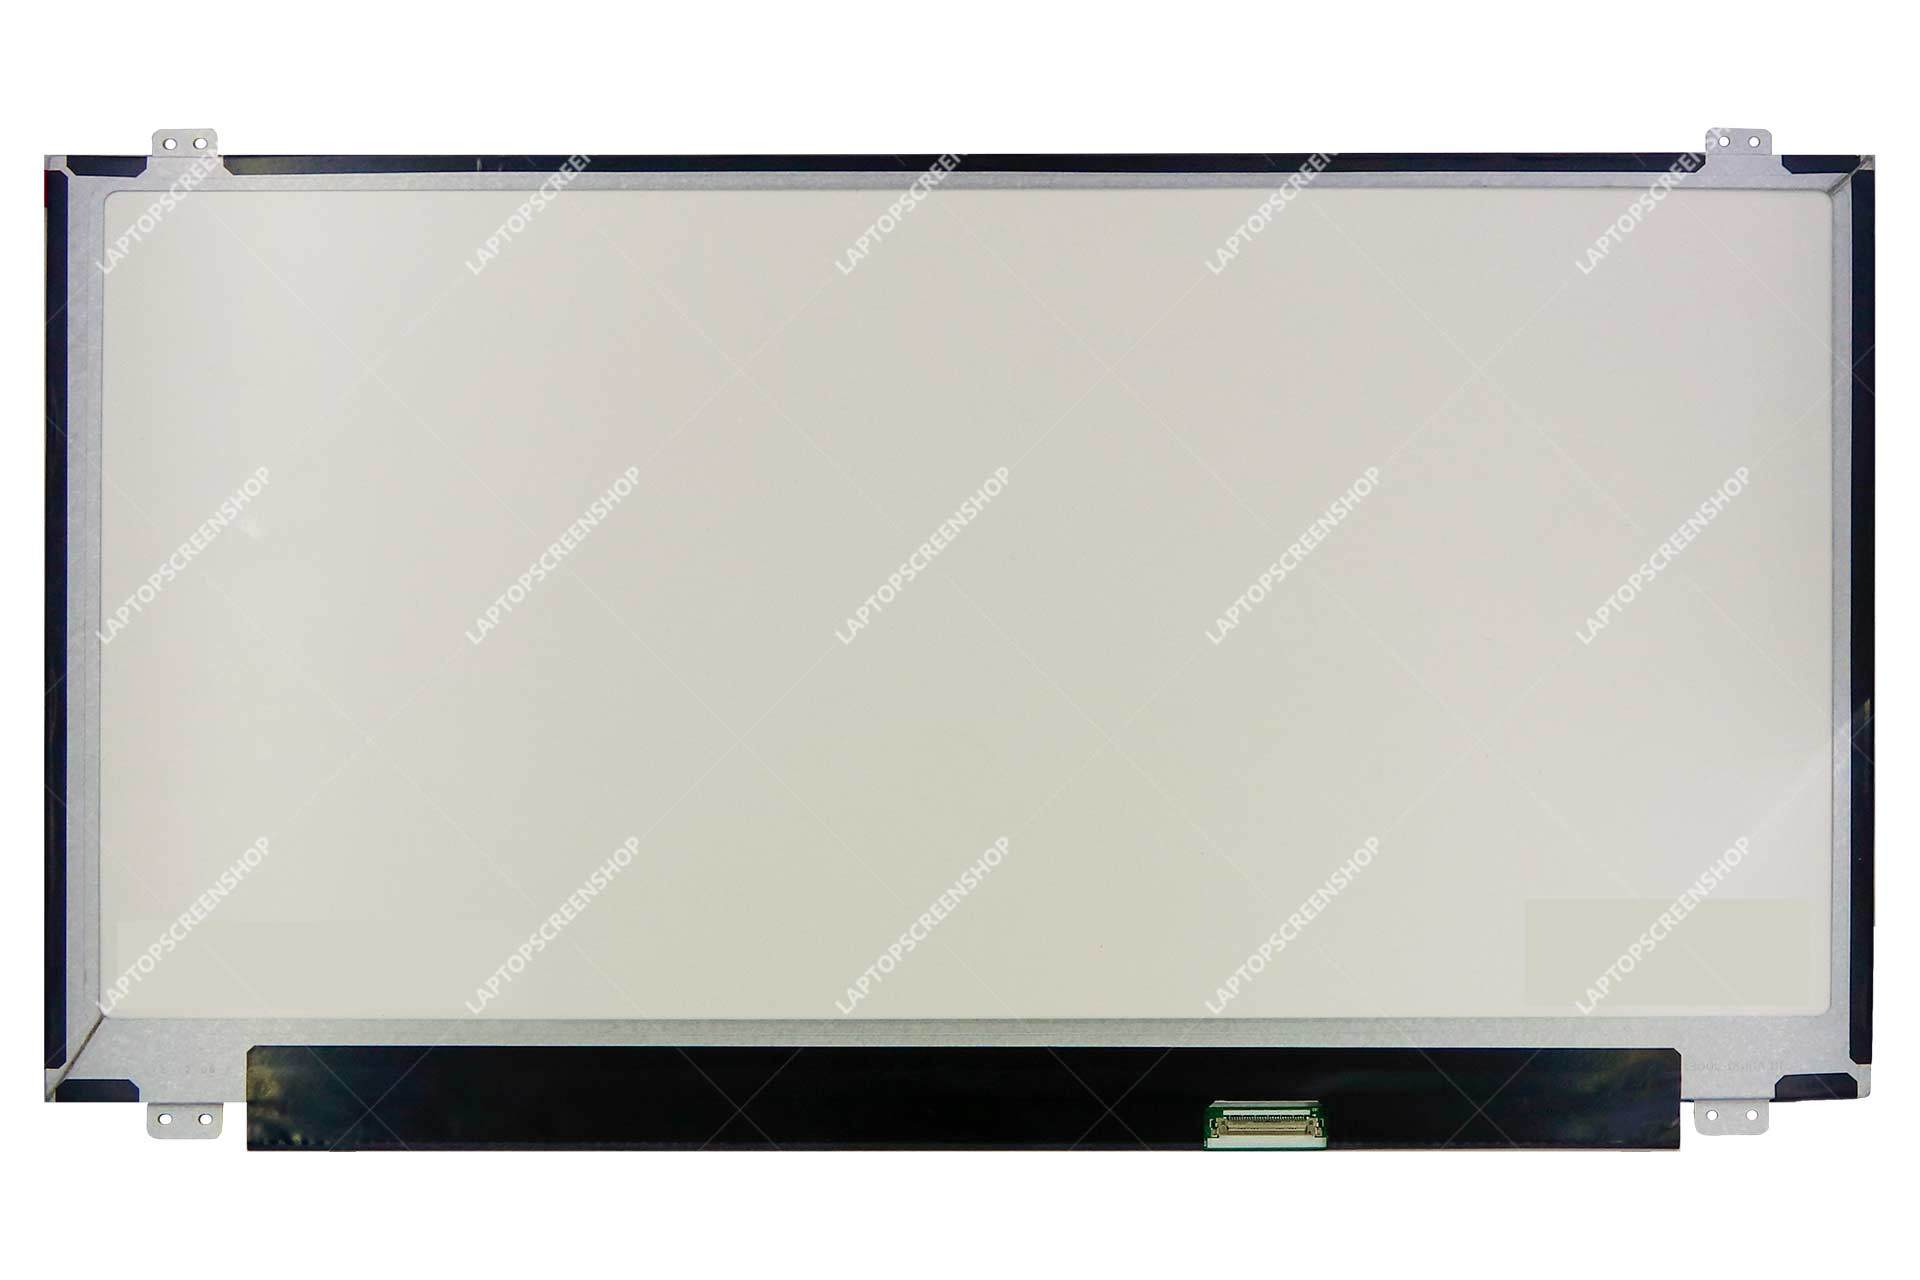 ACER-ASPIRE-E1-472G-SERIES-LCD |HD|فروشگاه لپ تاپ اسکرين | تعمير لپ تاپ